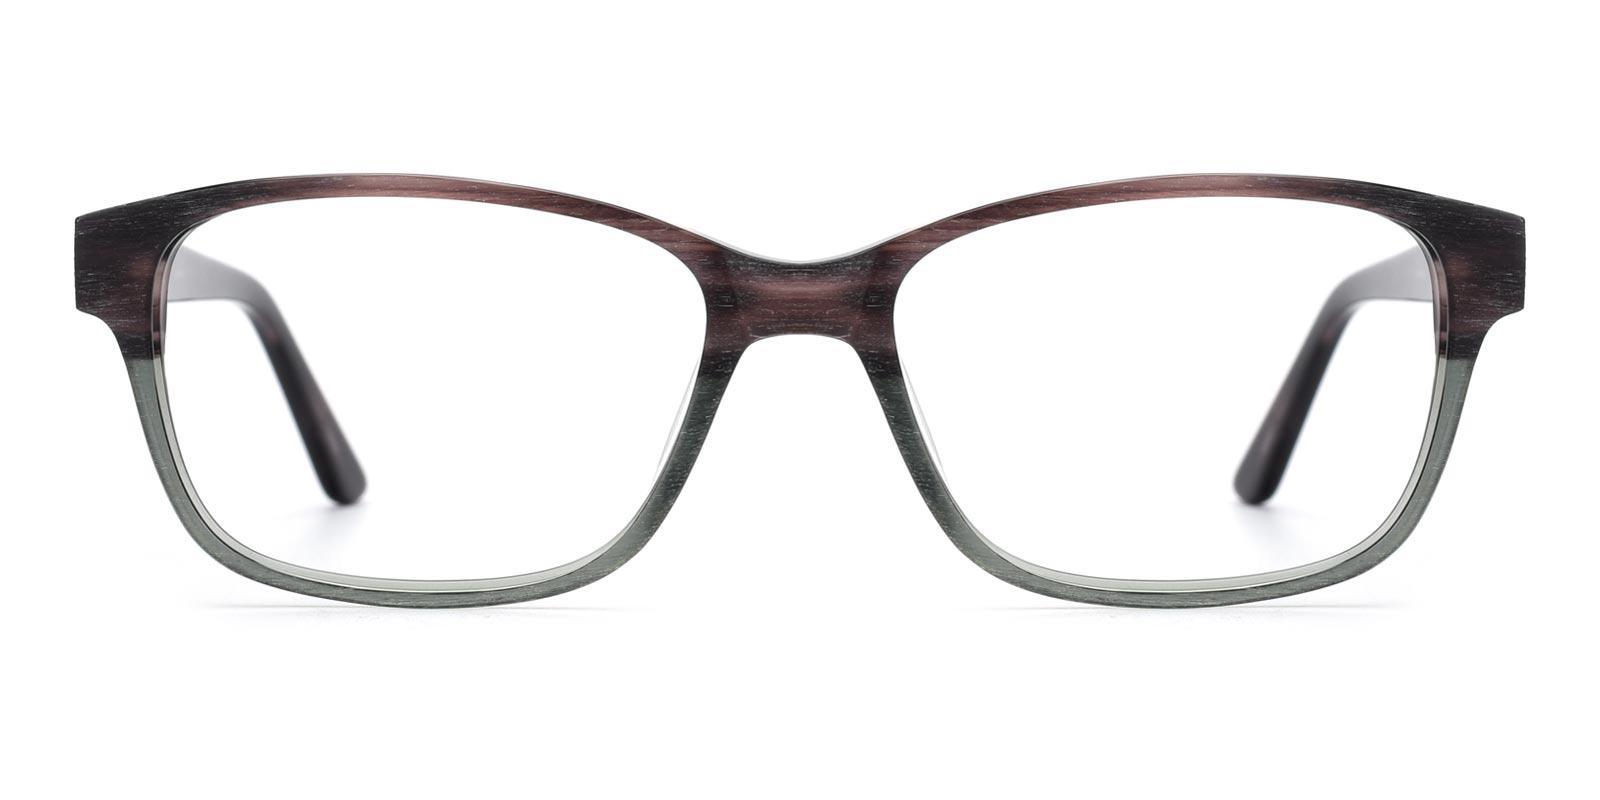 Prince-Green-Rectangle-Acetate-Eyeglasses-detail